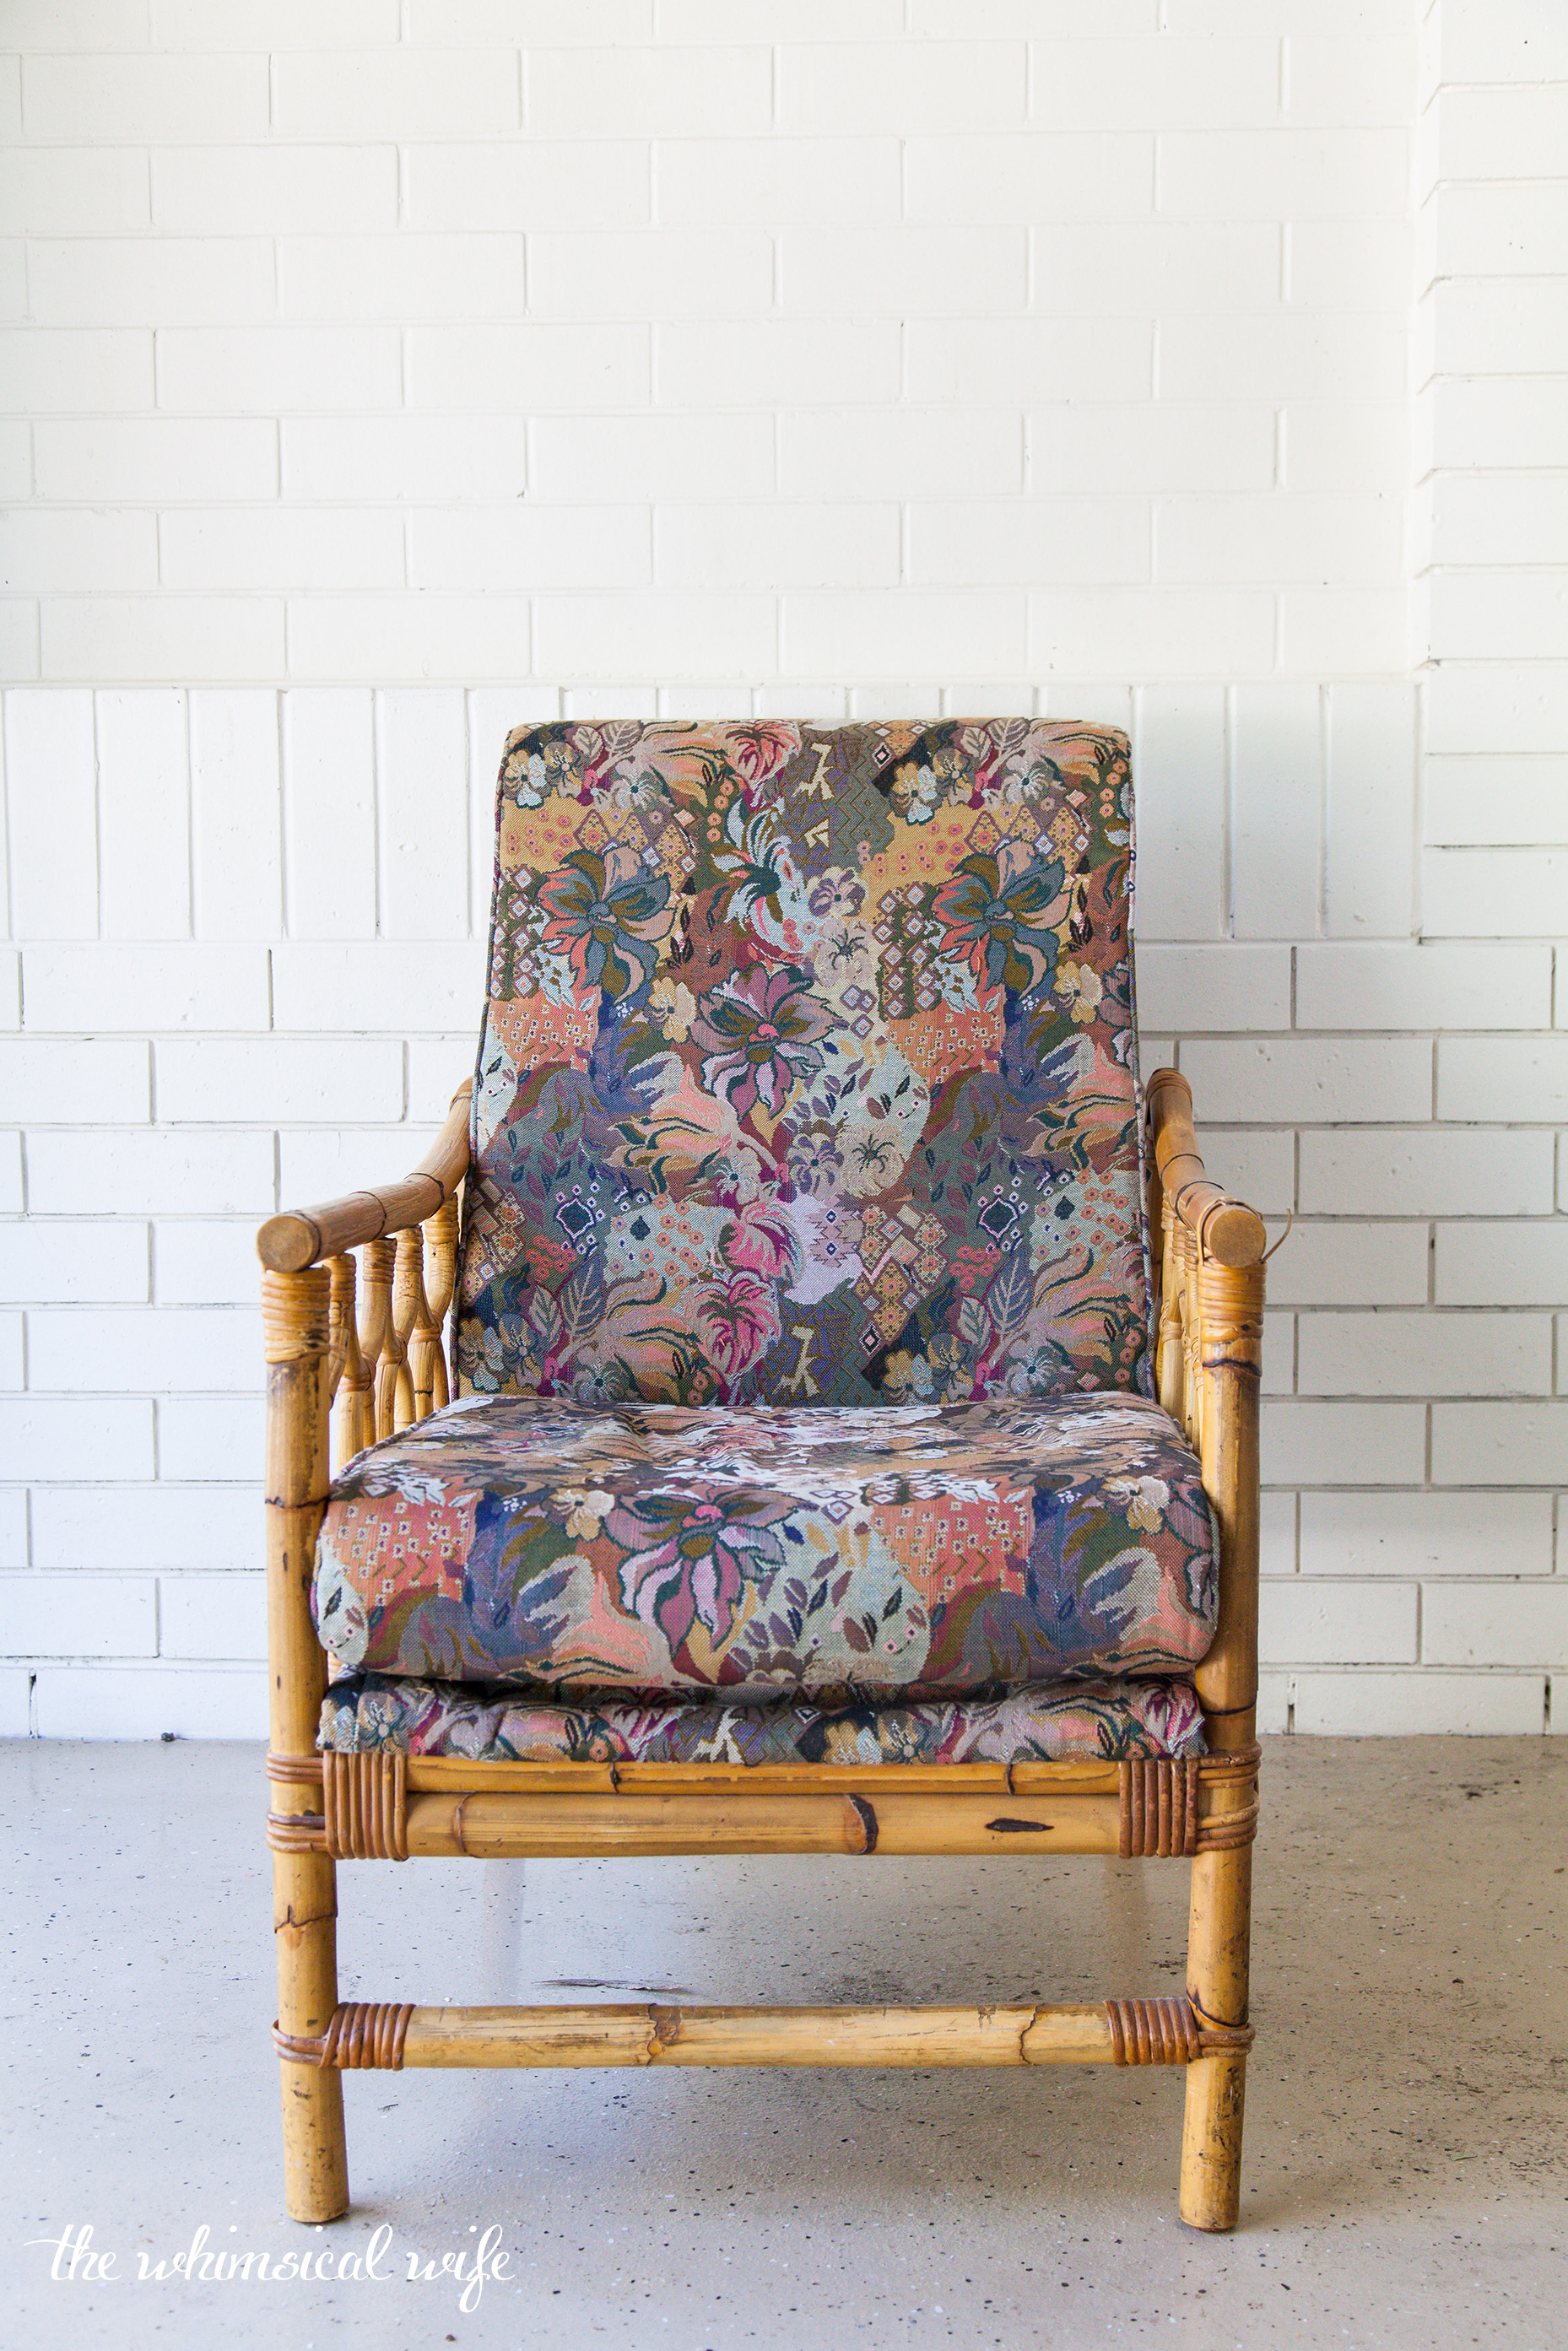 Bamboo Chair-3338.jpg